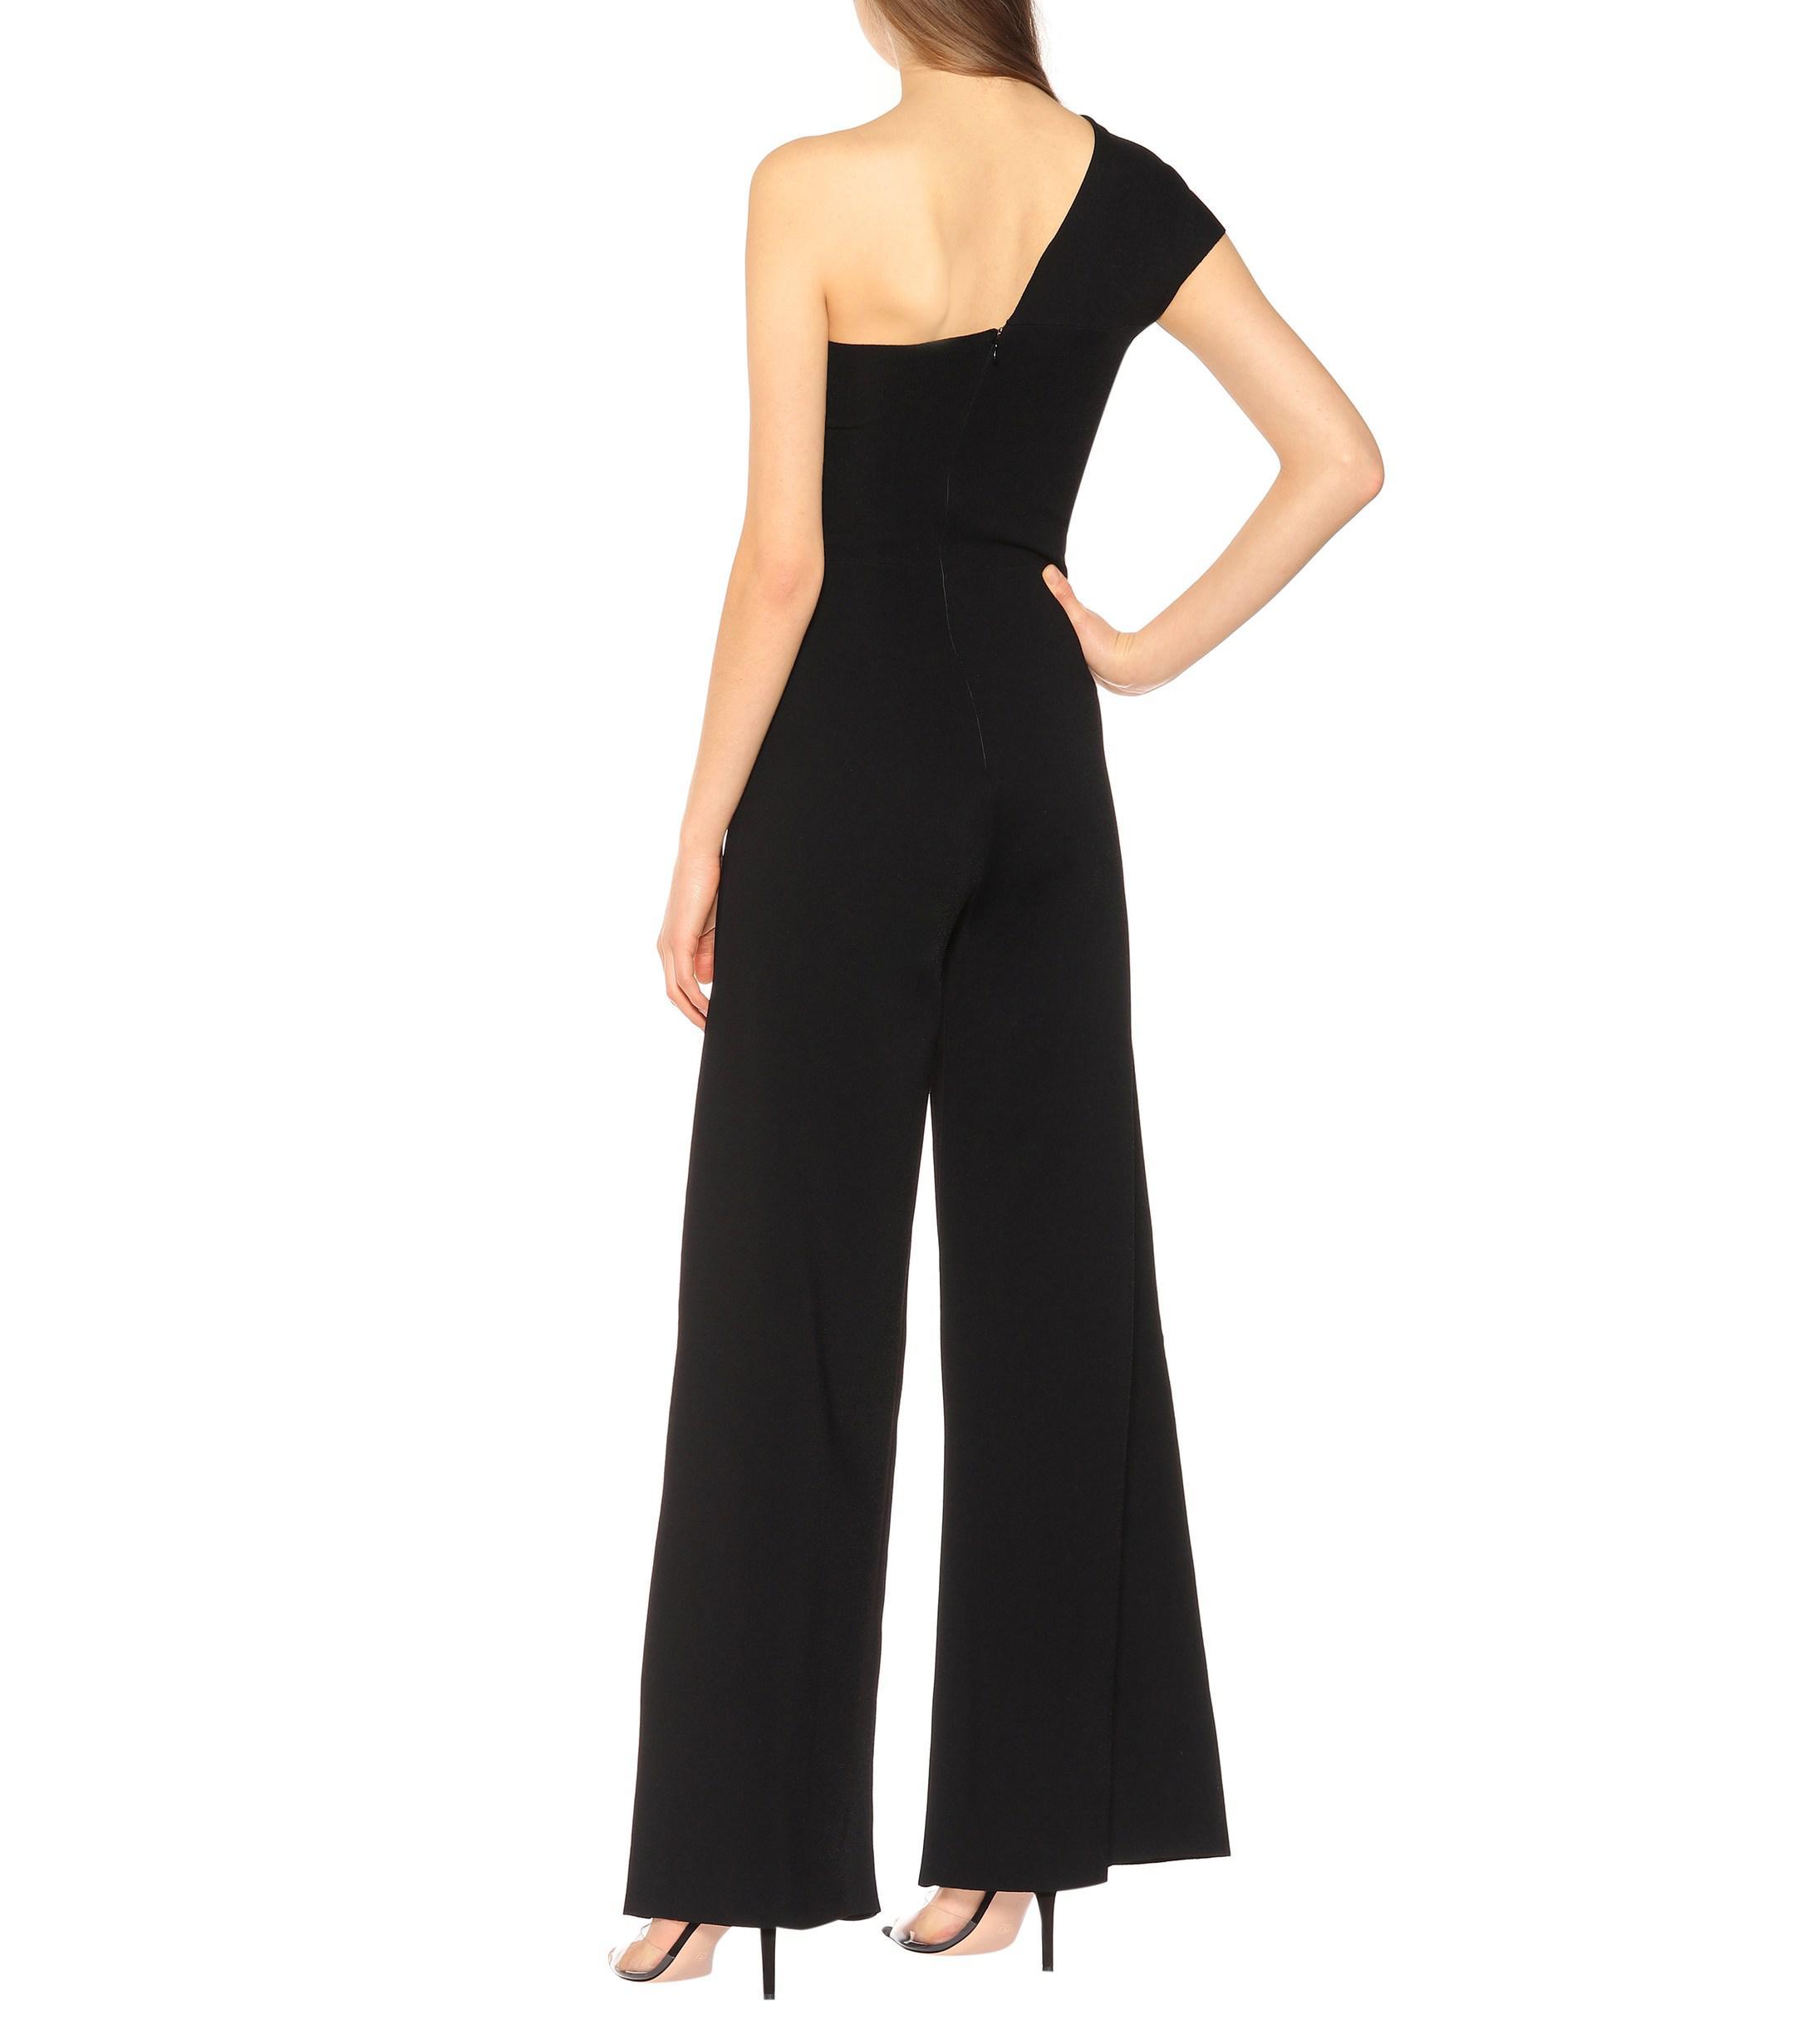 7812a8749538 Stella McCartney - Black One-shoulder Crêpe Jumpsuit - Lyst. View fullscreen